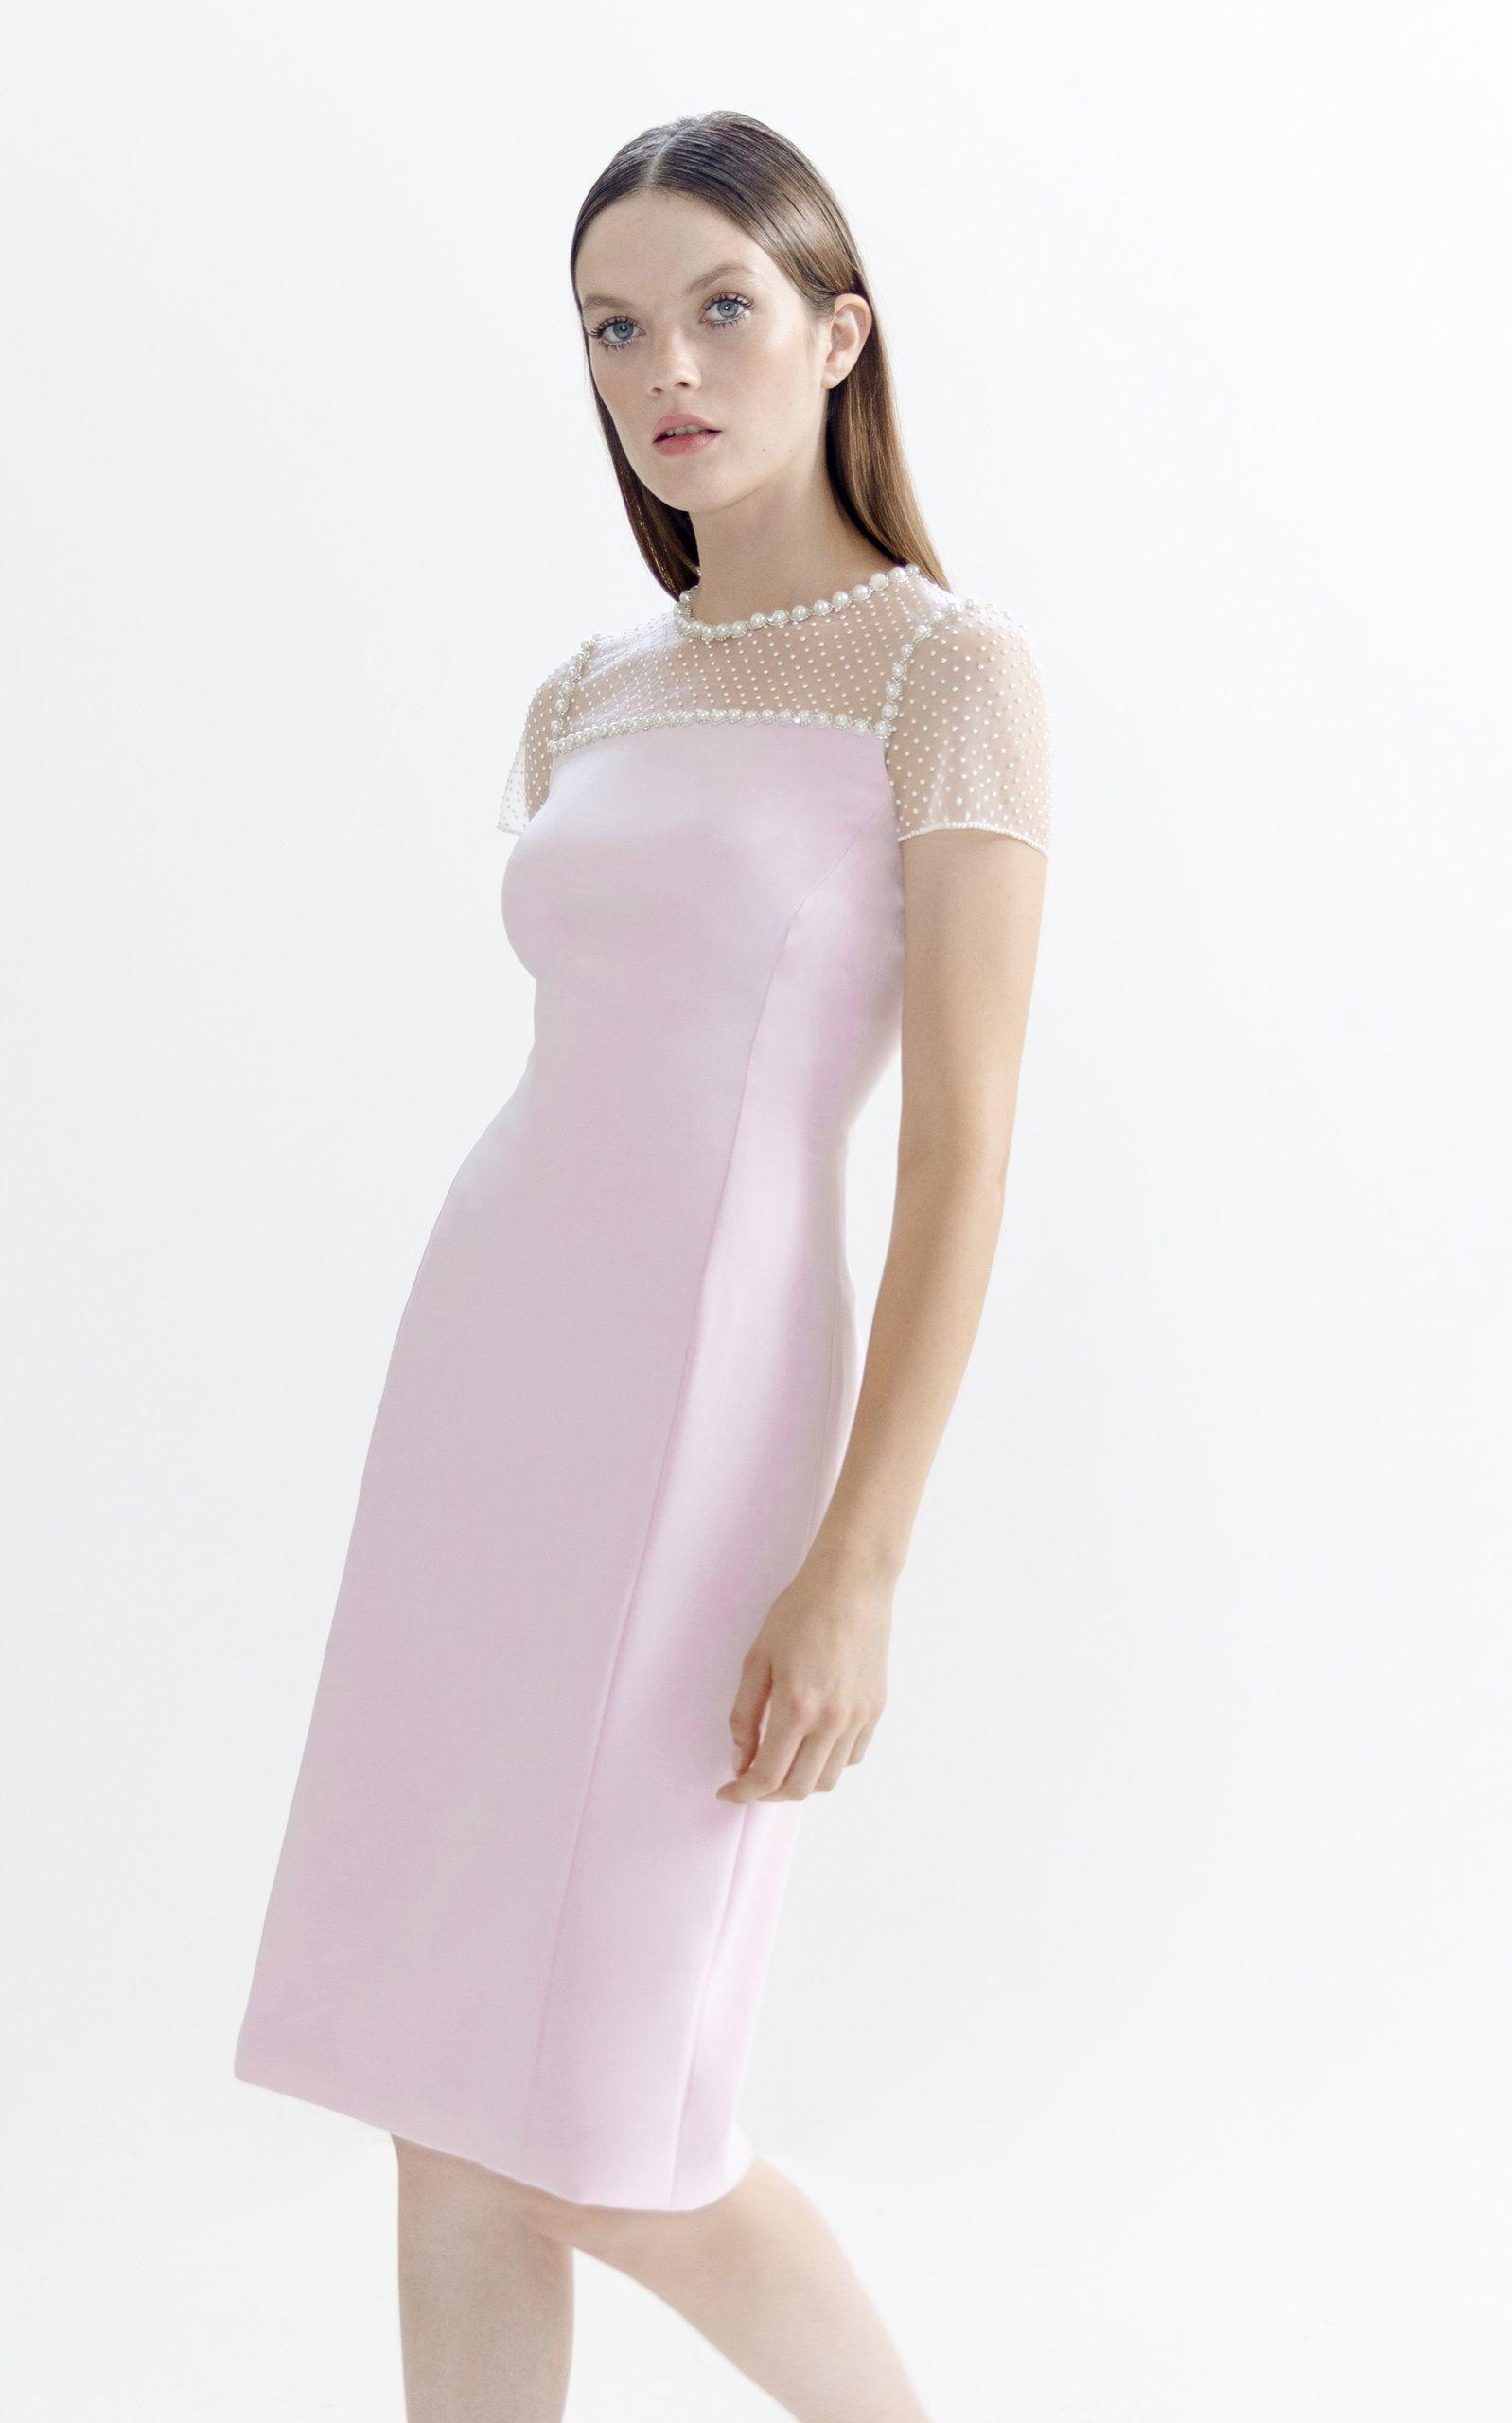 Photo of Illusion Neckline Satin Dress by Jenny Packham | Moda Operandi